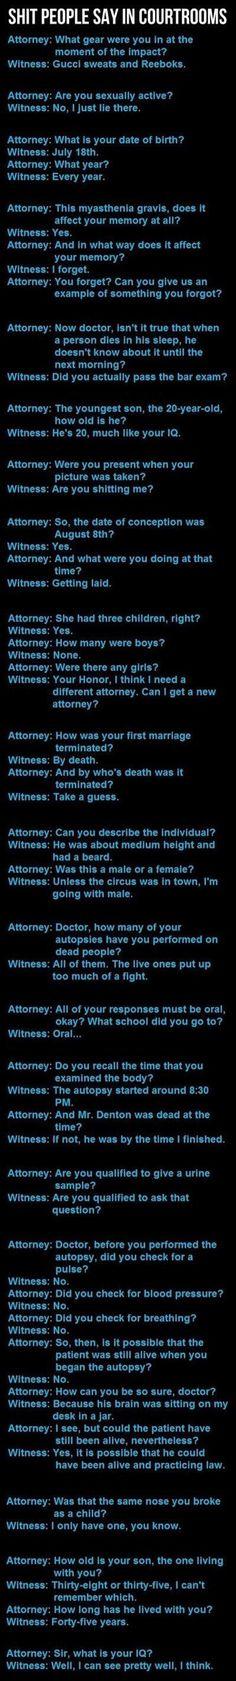 Attorneys are idiots...